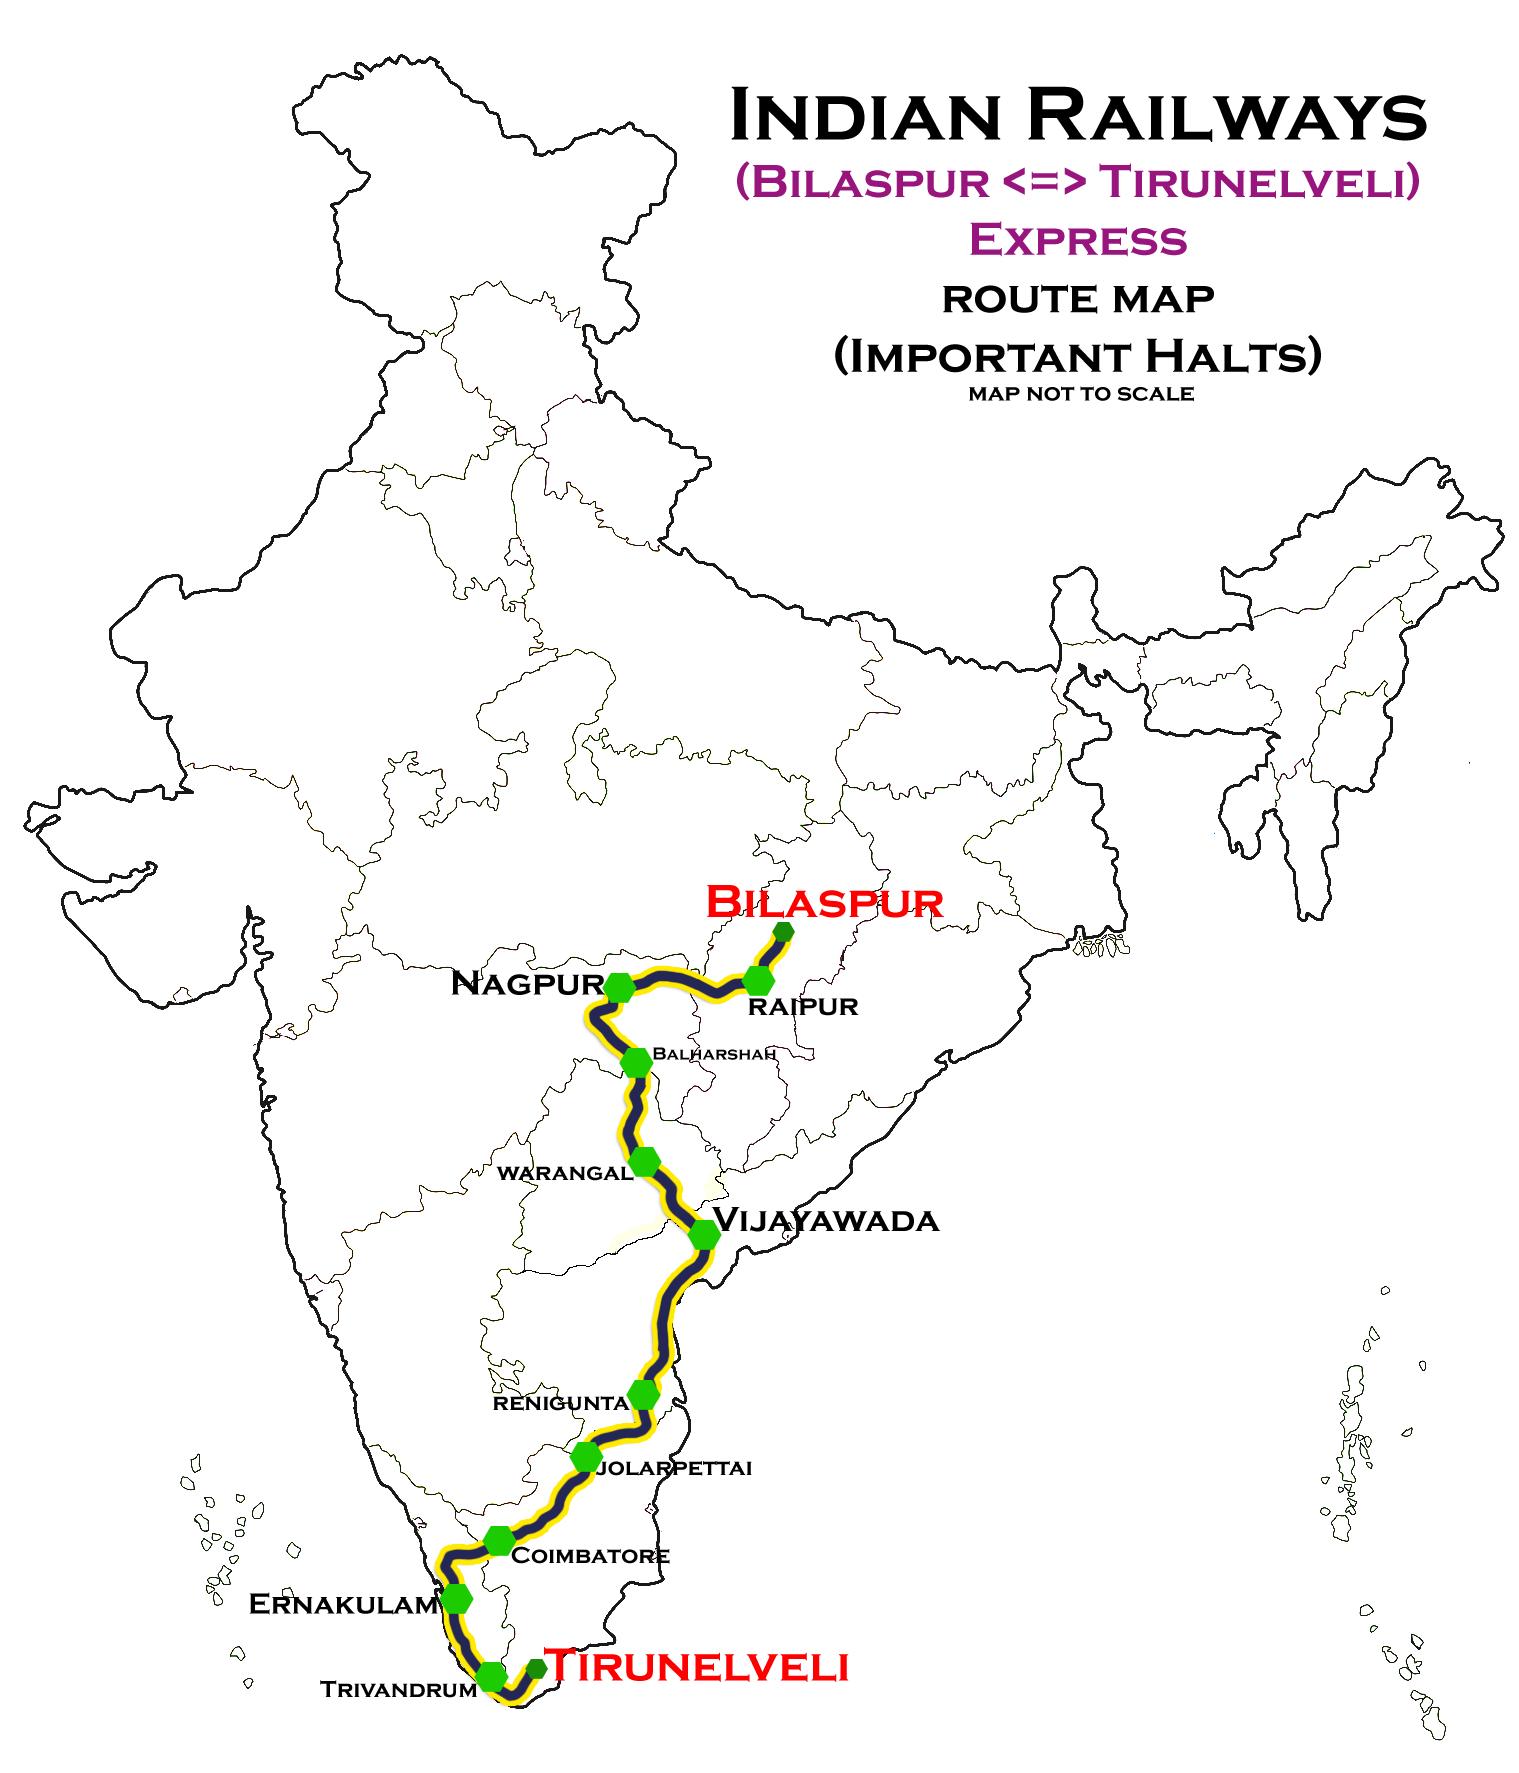 Tirunelveli−Bilaspur Express - Wikipedia